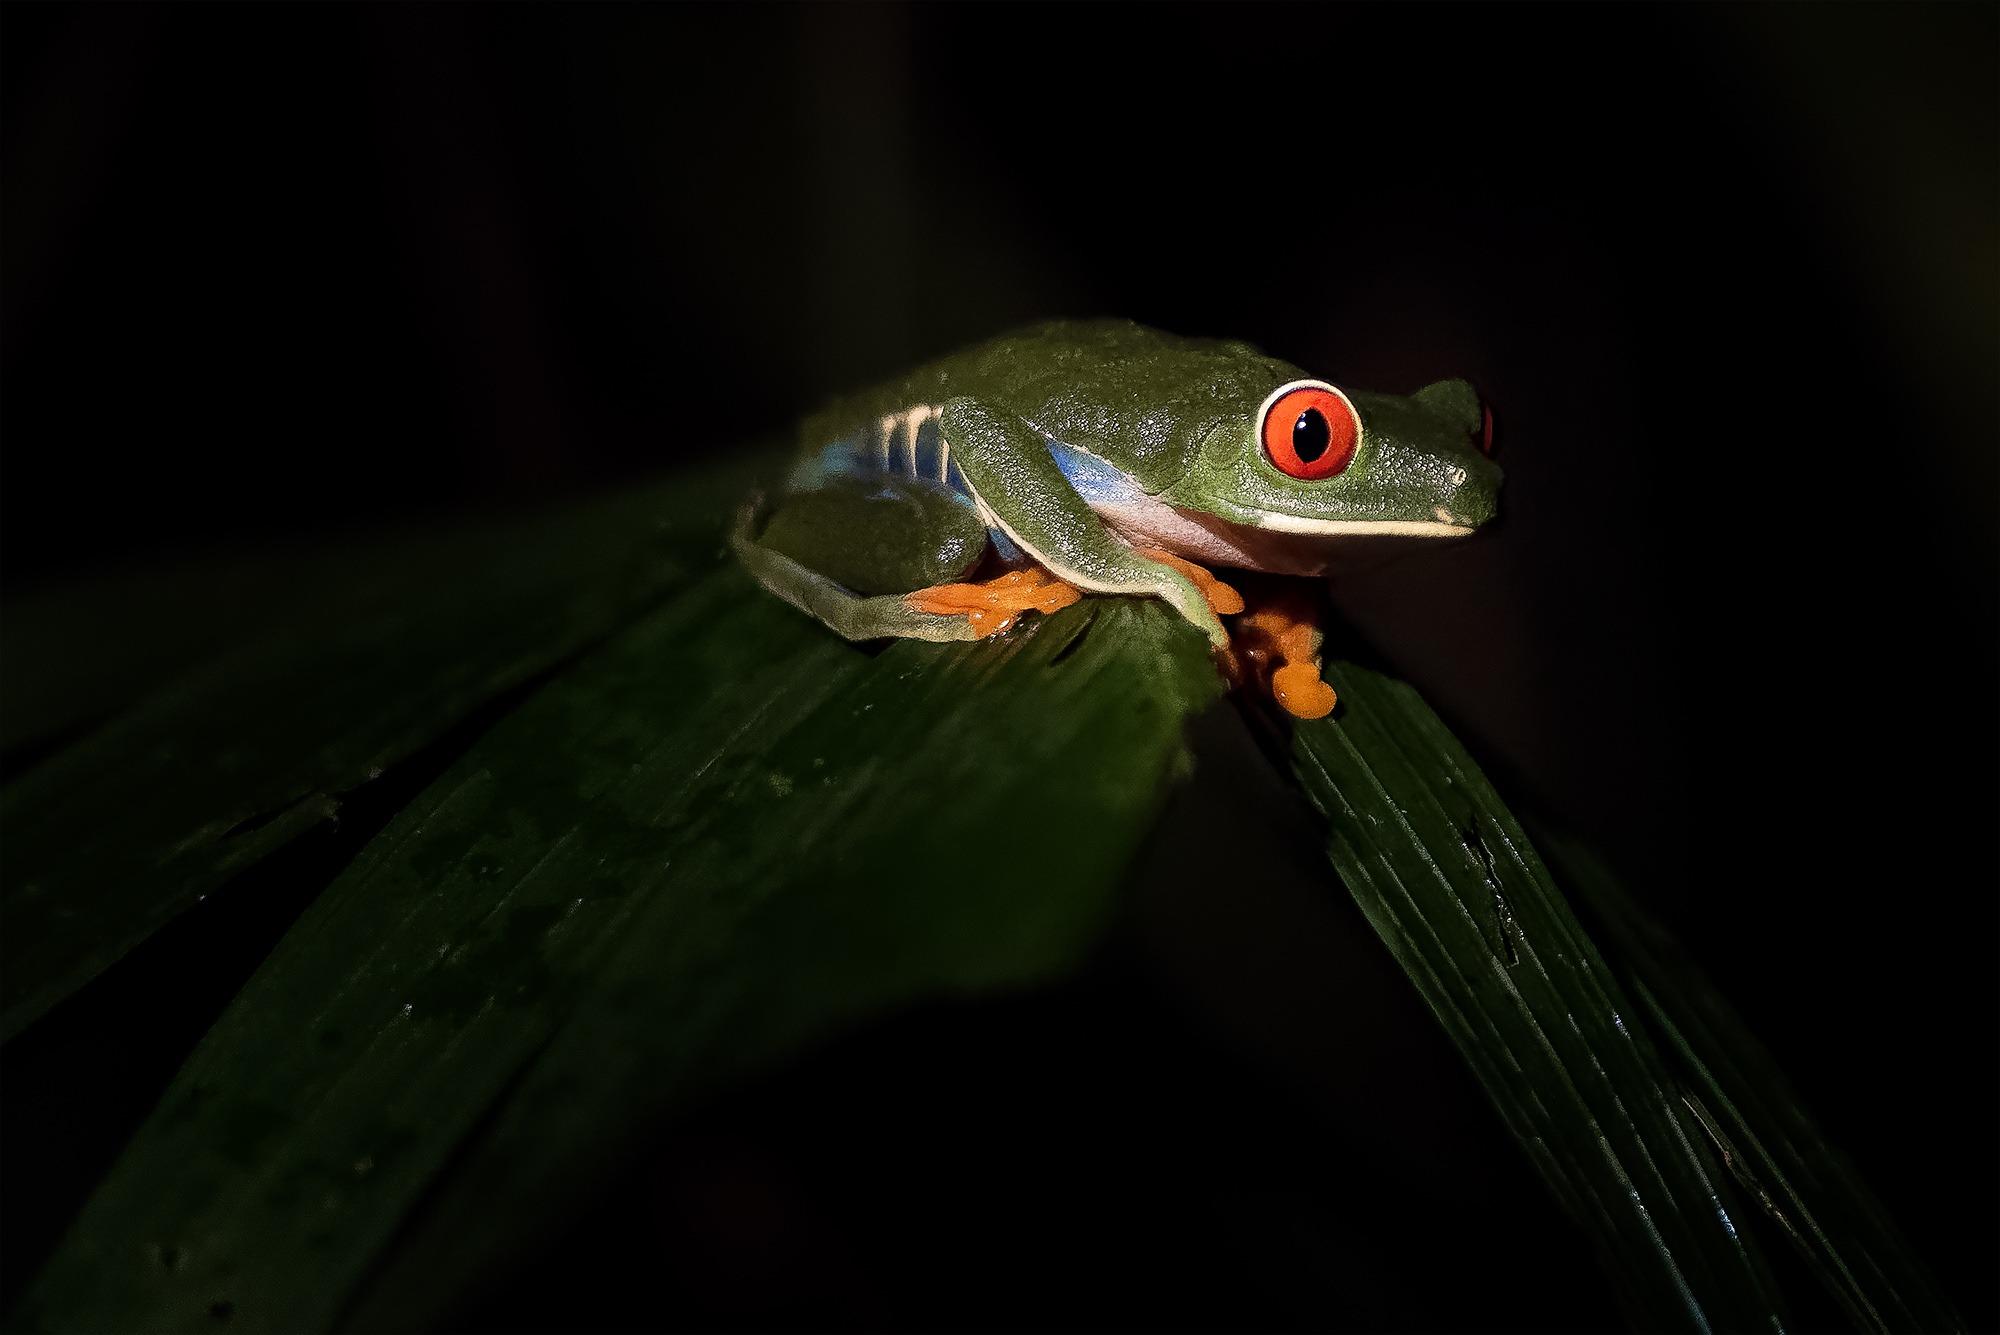 Rainette au yeux rouge, Bijagua de Upala, Costa Rica